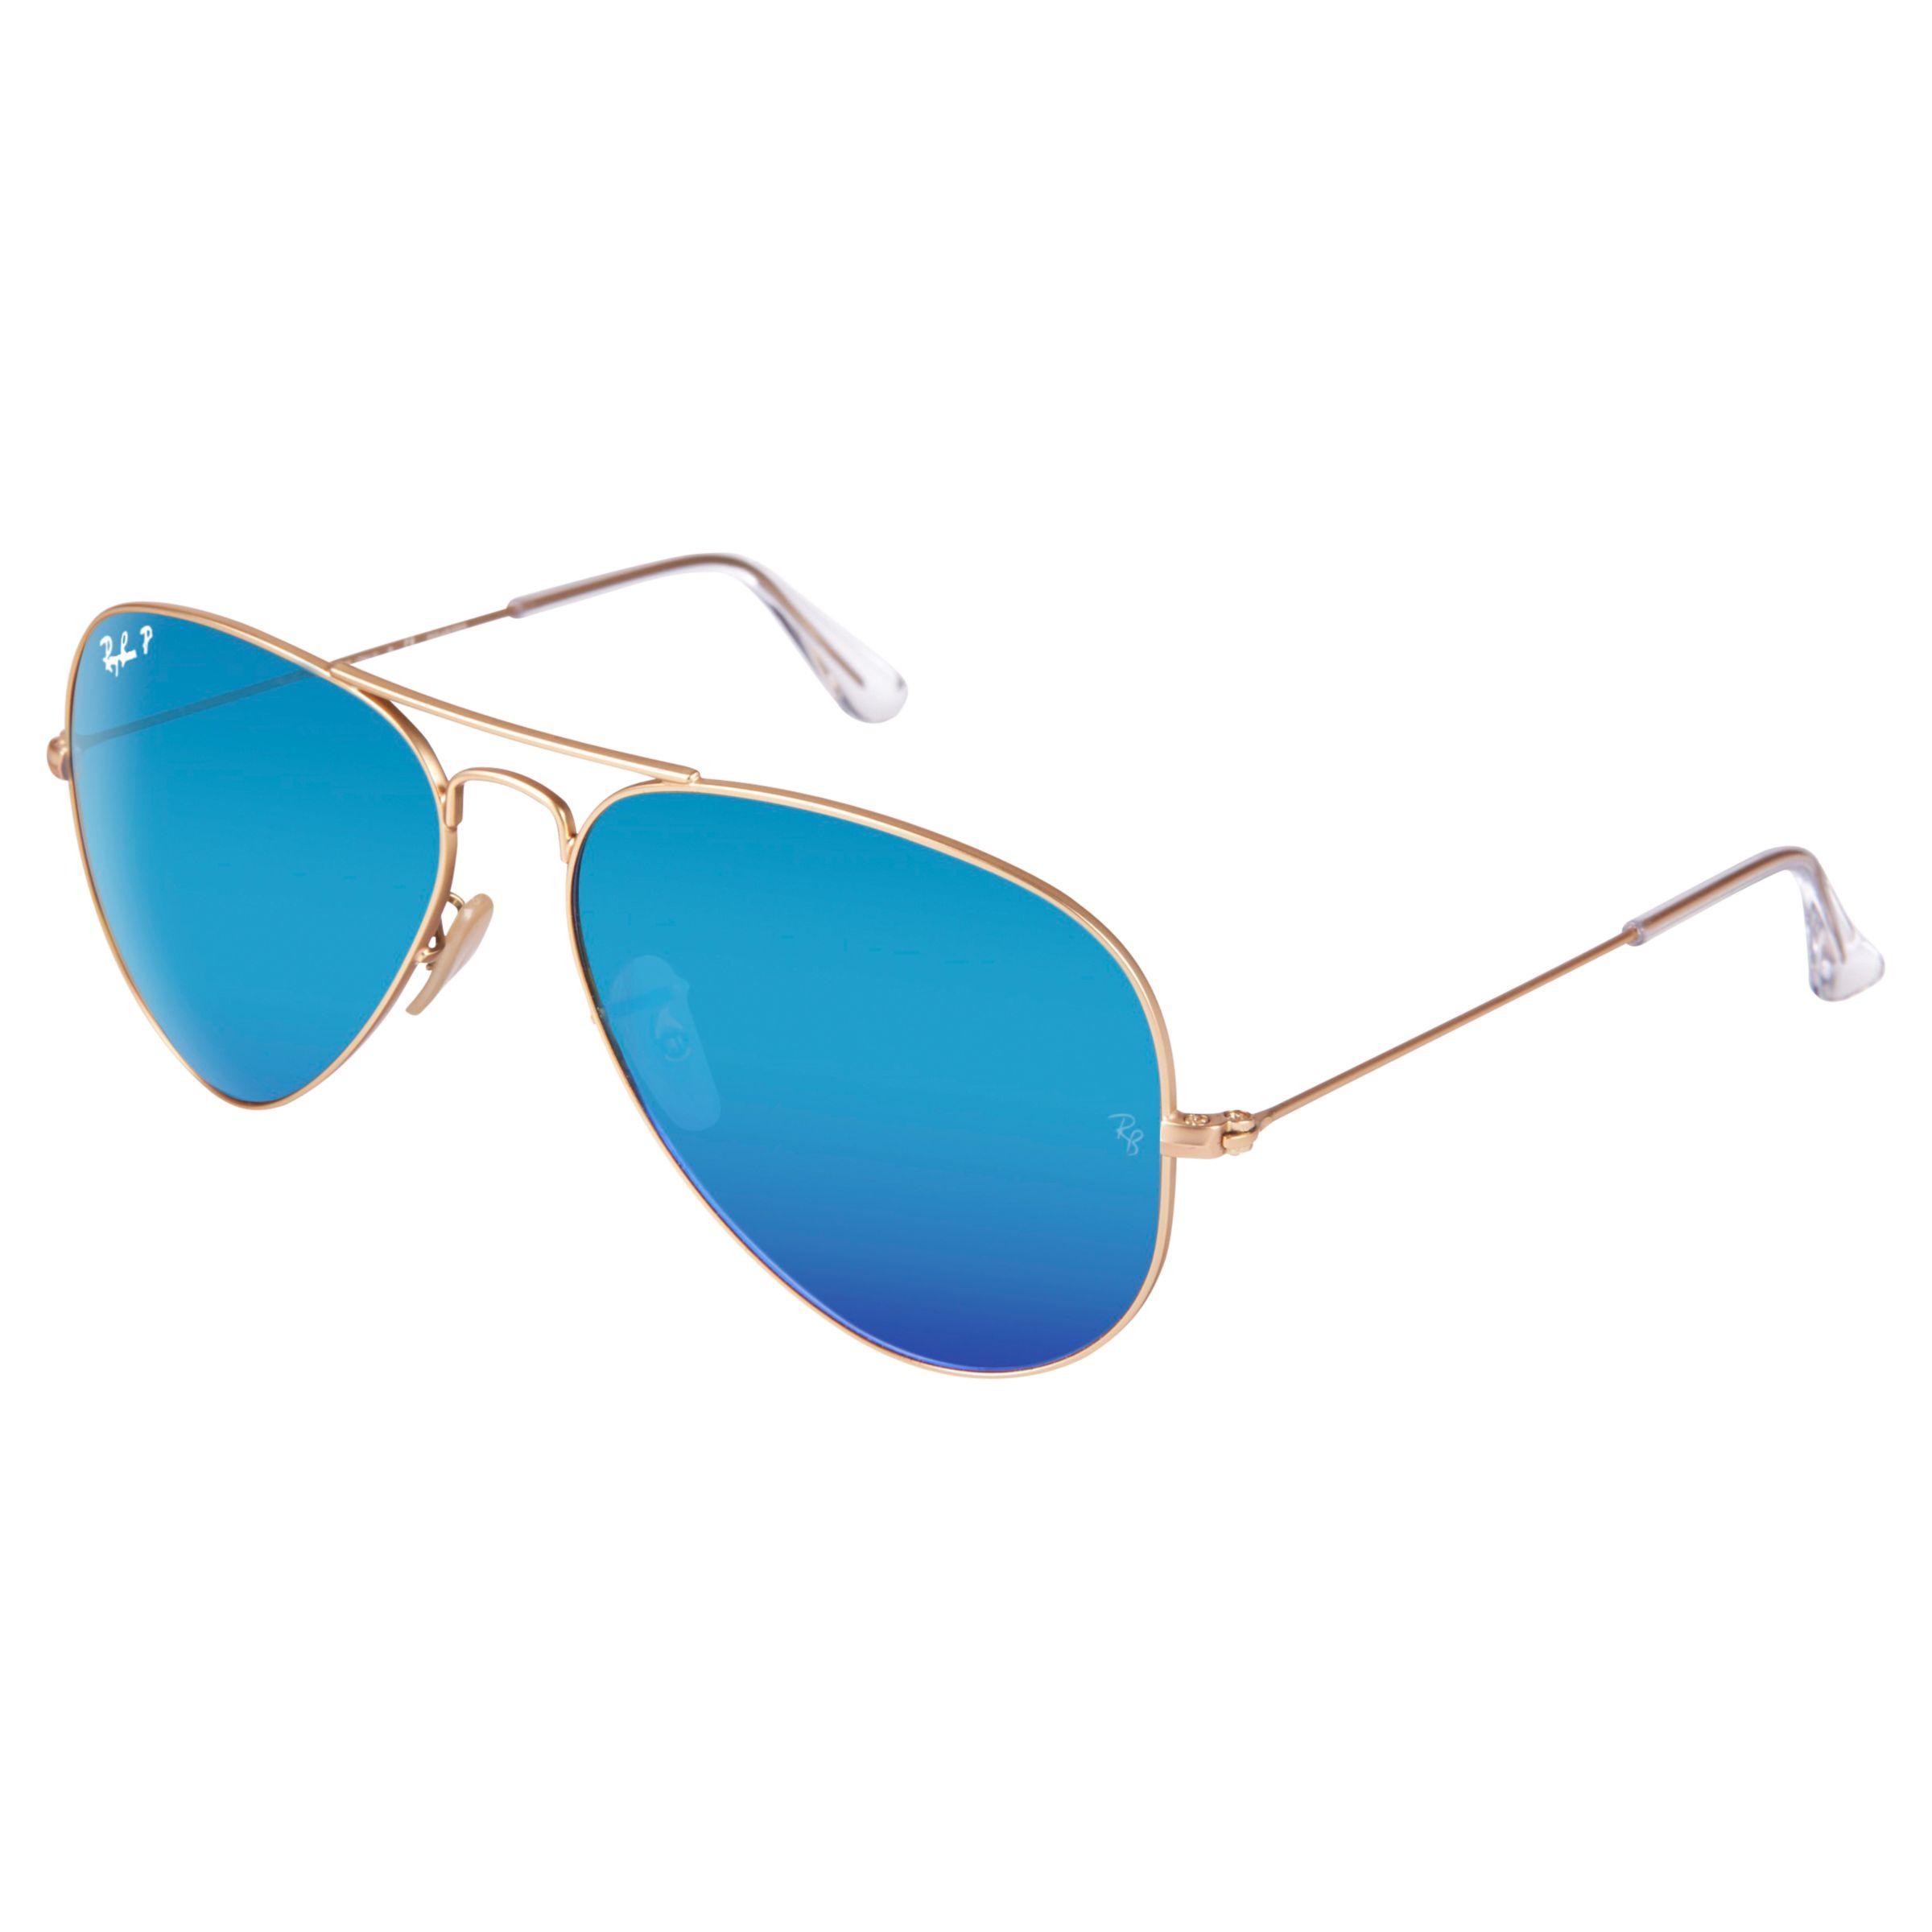 Ray-ban Ray-Ban RB3025 Original Aviator Sunglasses